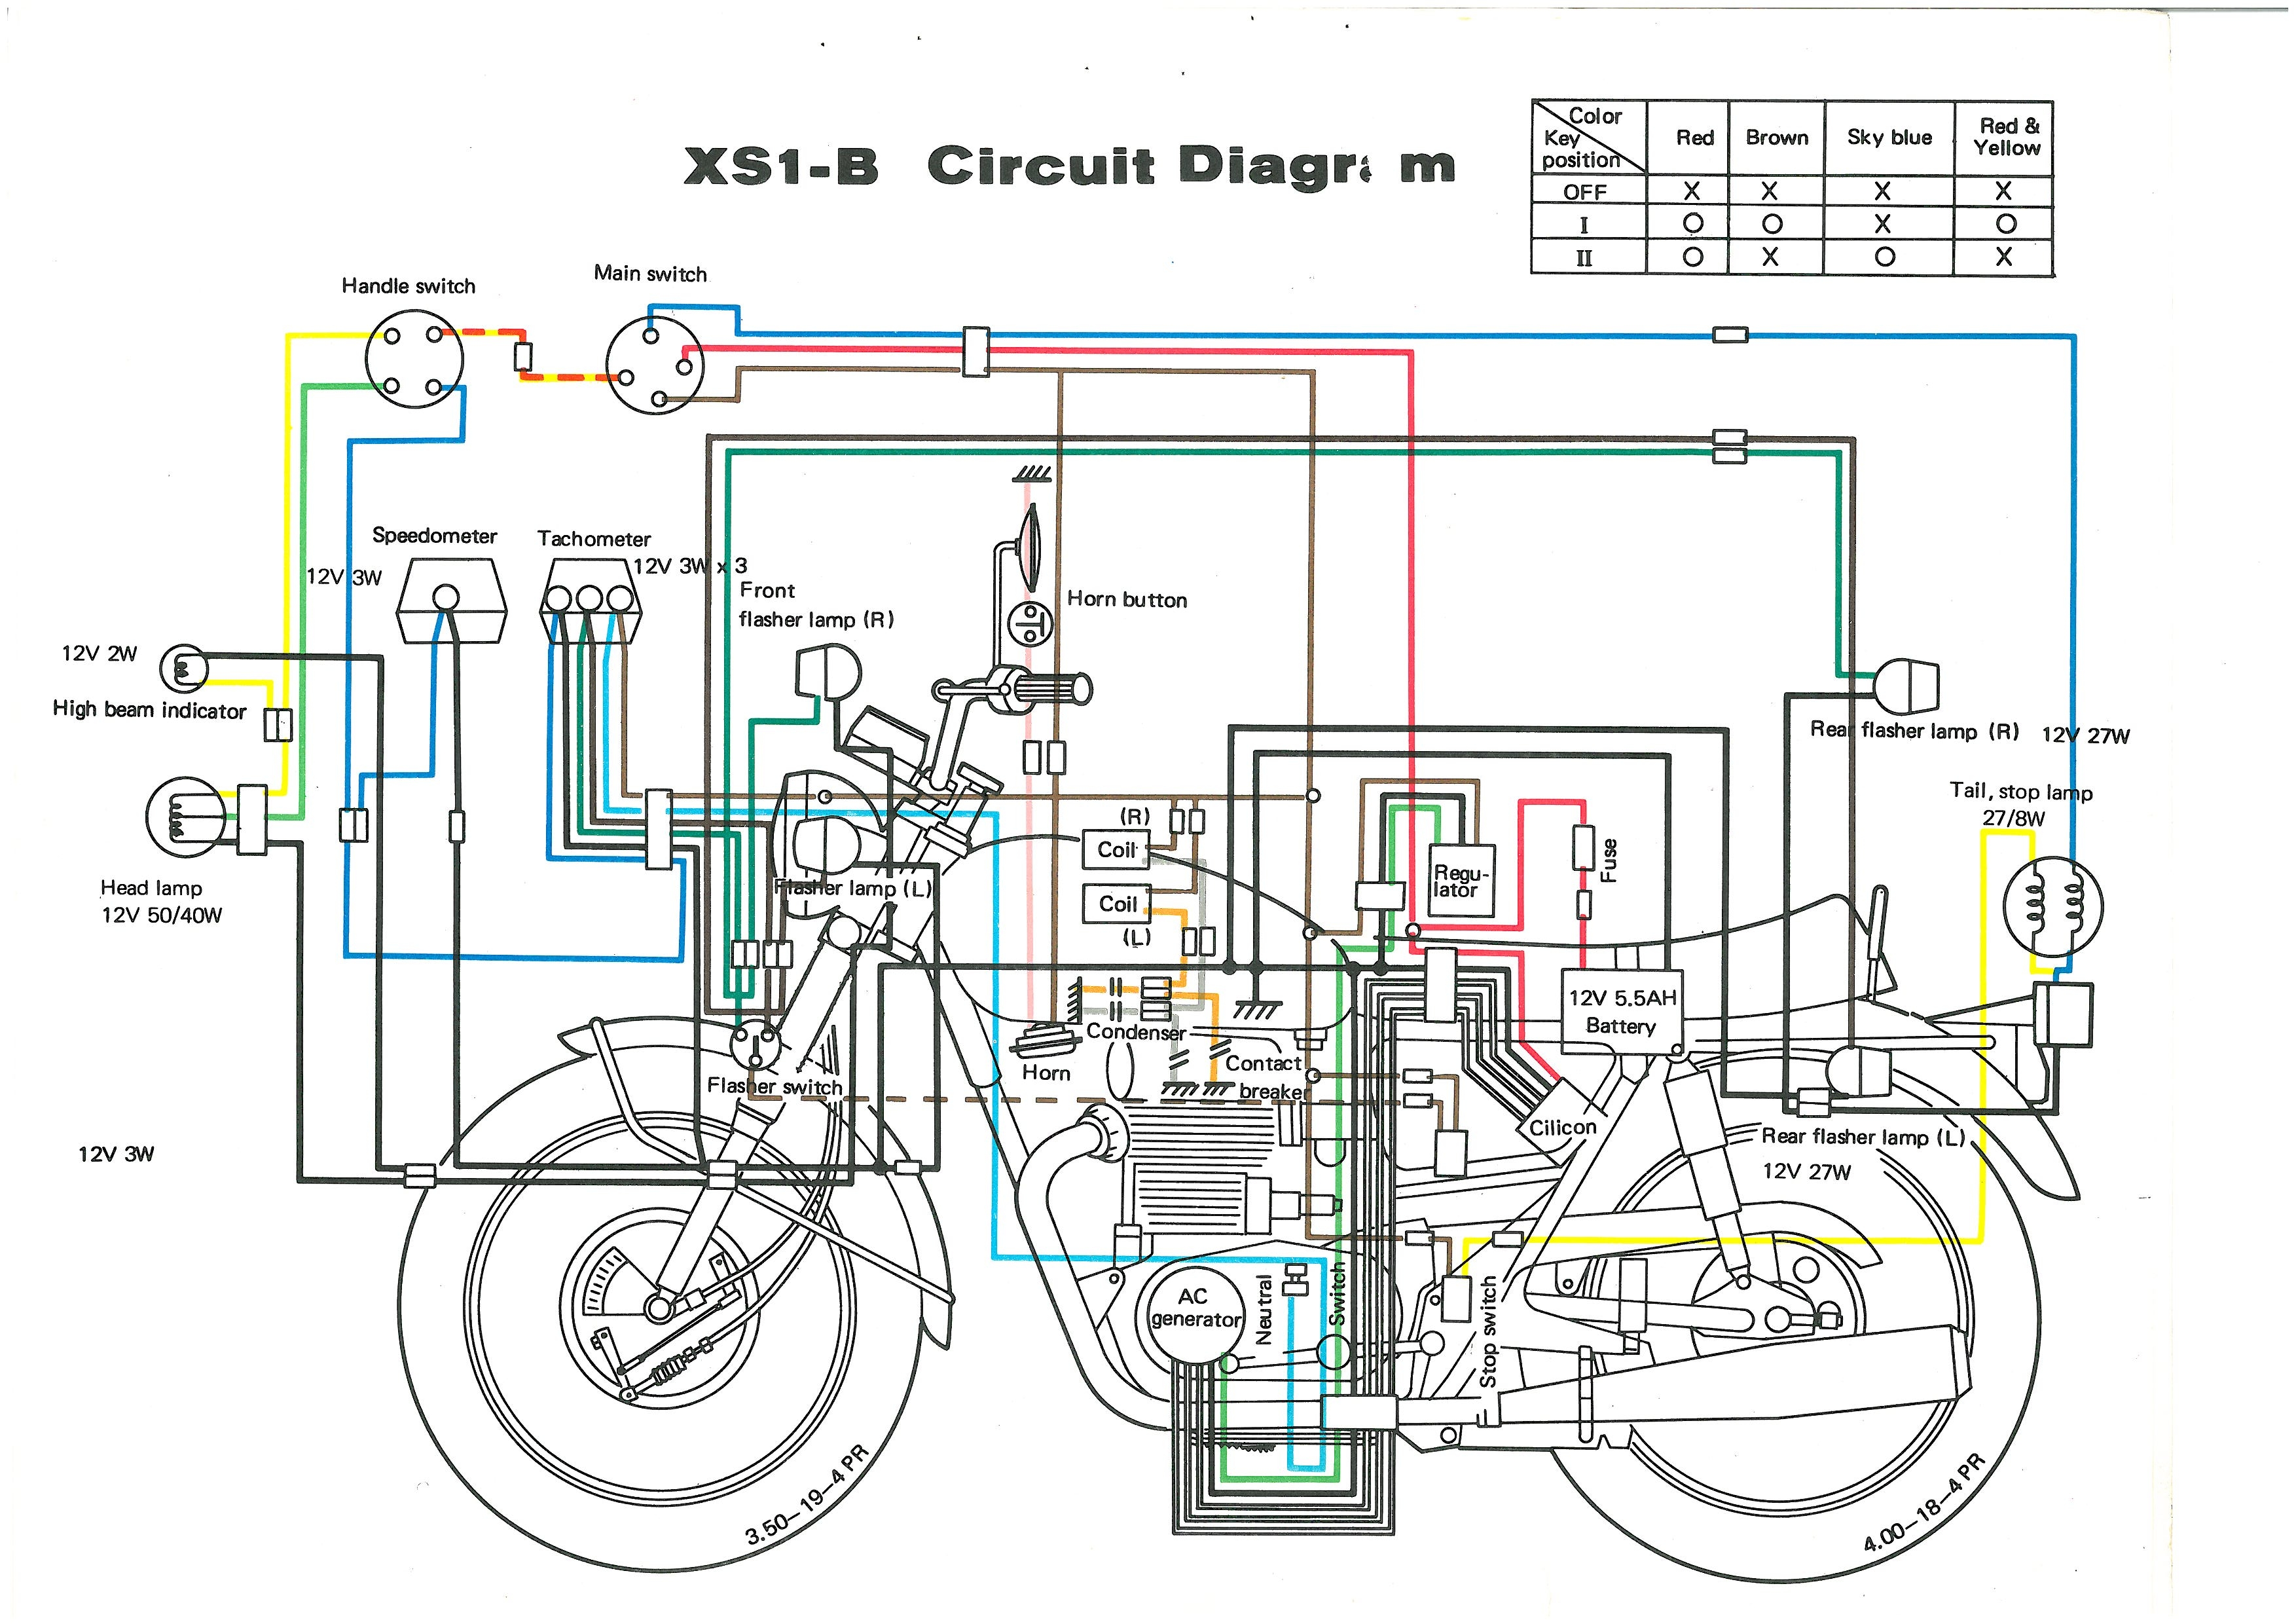 1980 Yamaha Xs650 Ignition Wiring Diagram